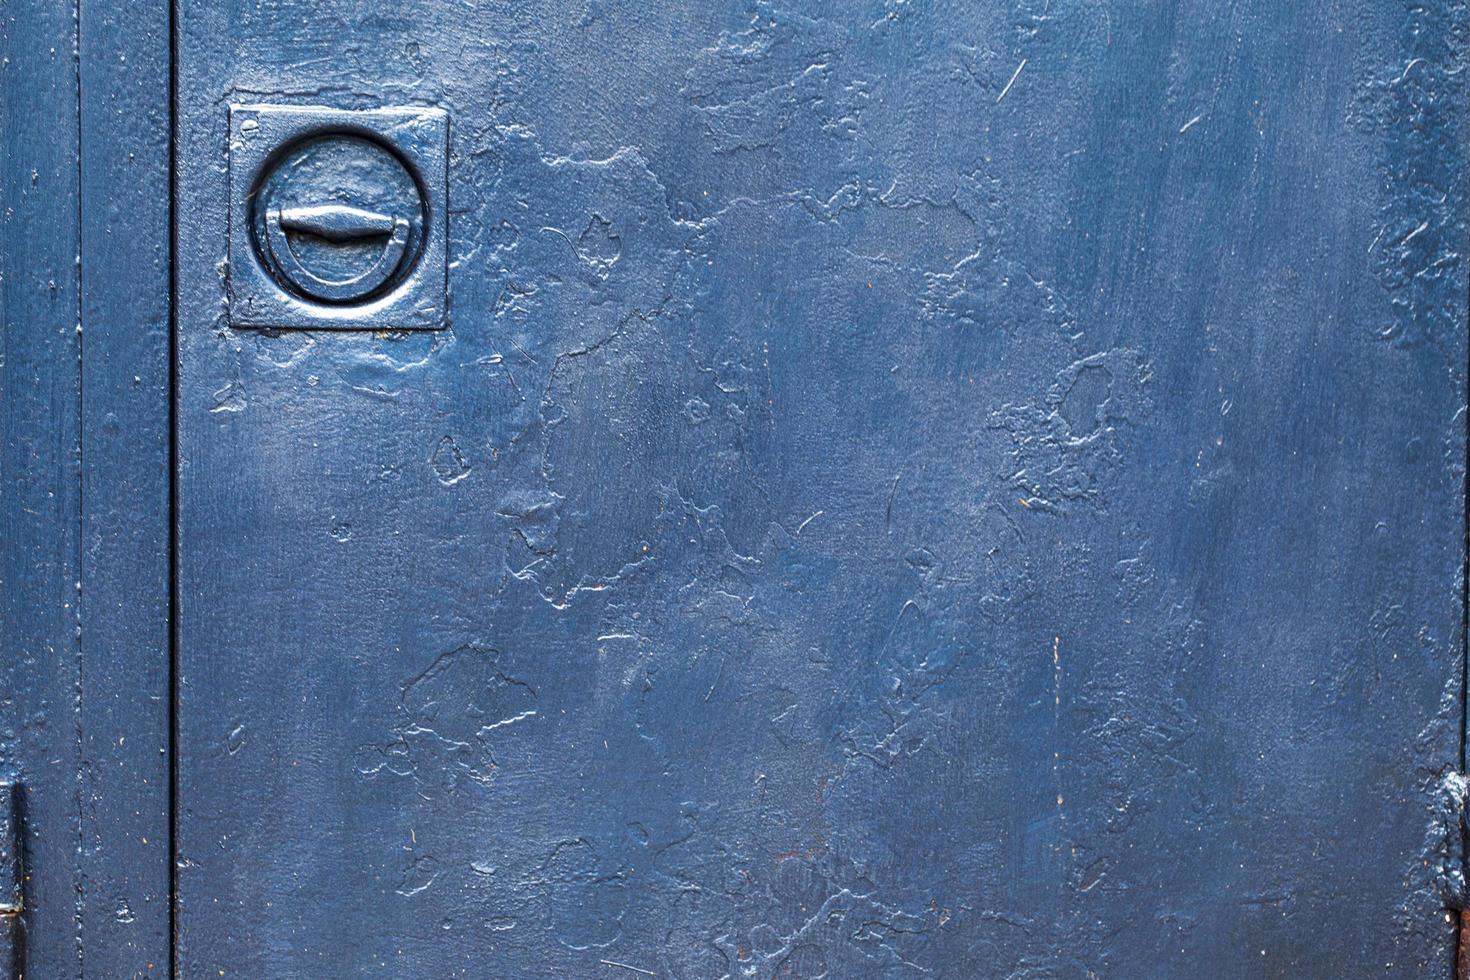 Dirty Rusty Grunge Metallic Iron Background photo